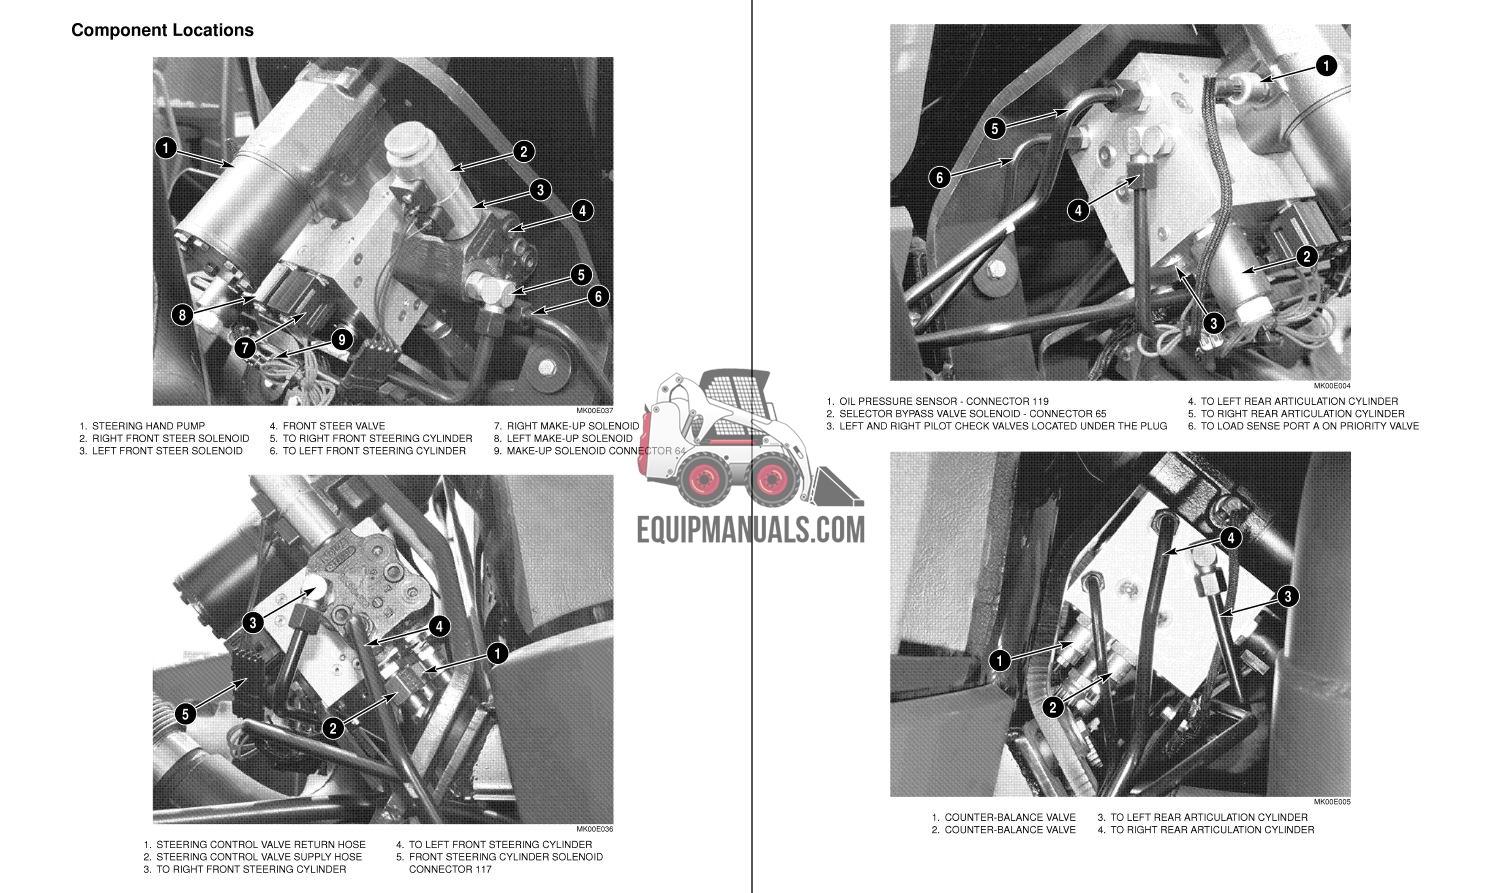 case ih stx275 thru stx500 tractor service manual  pin jee0102001   up  equipmanuals com 2013 Ford STX Case IH Steiger